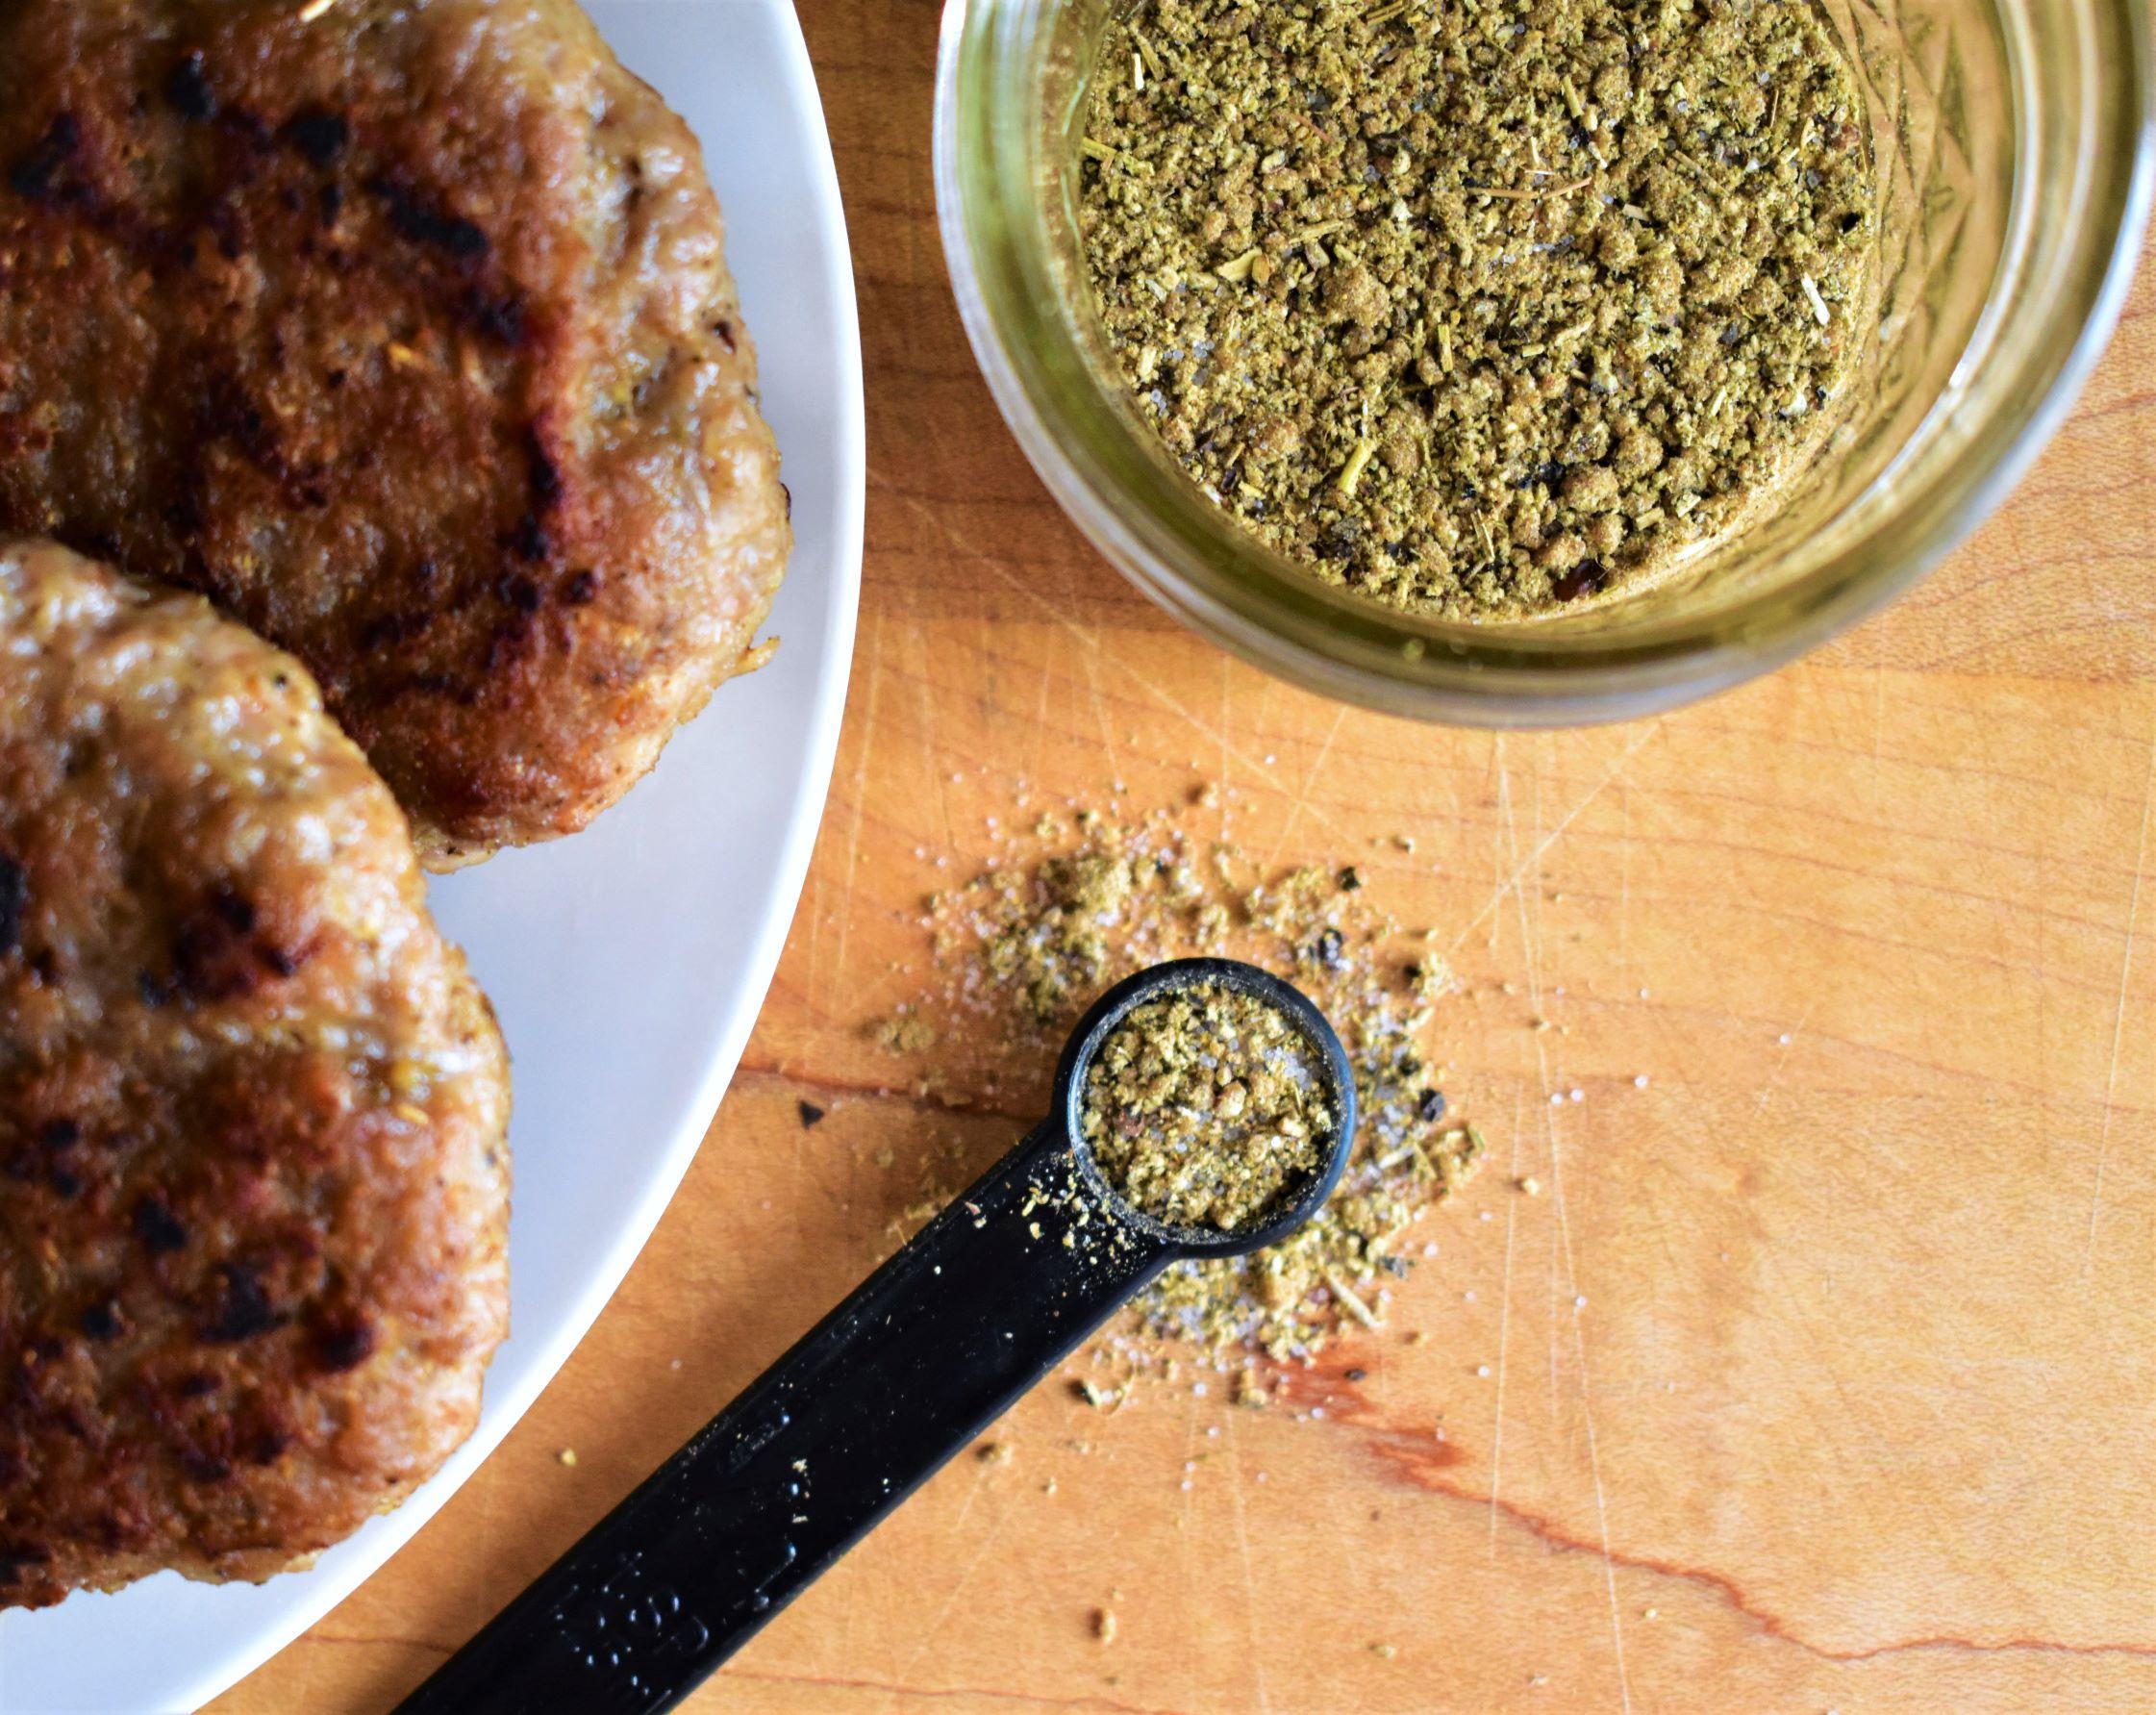 Michael's Breakfast Sausage Seasoning Mix